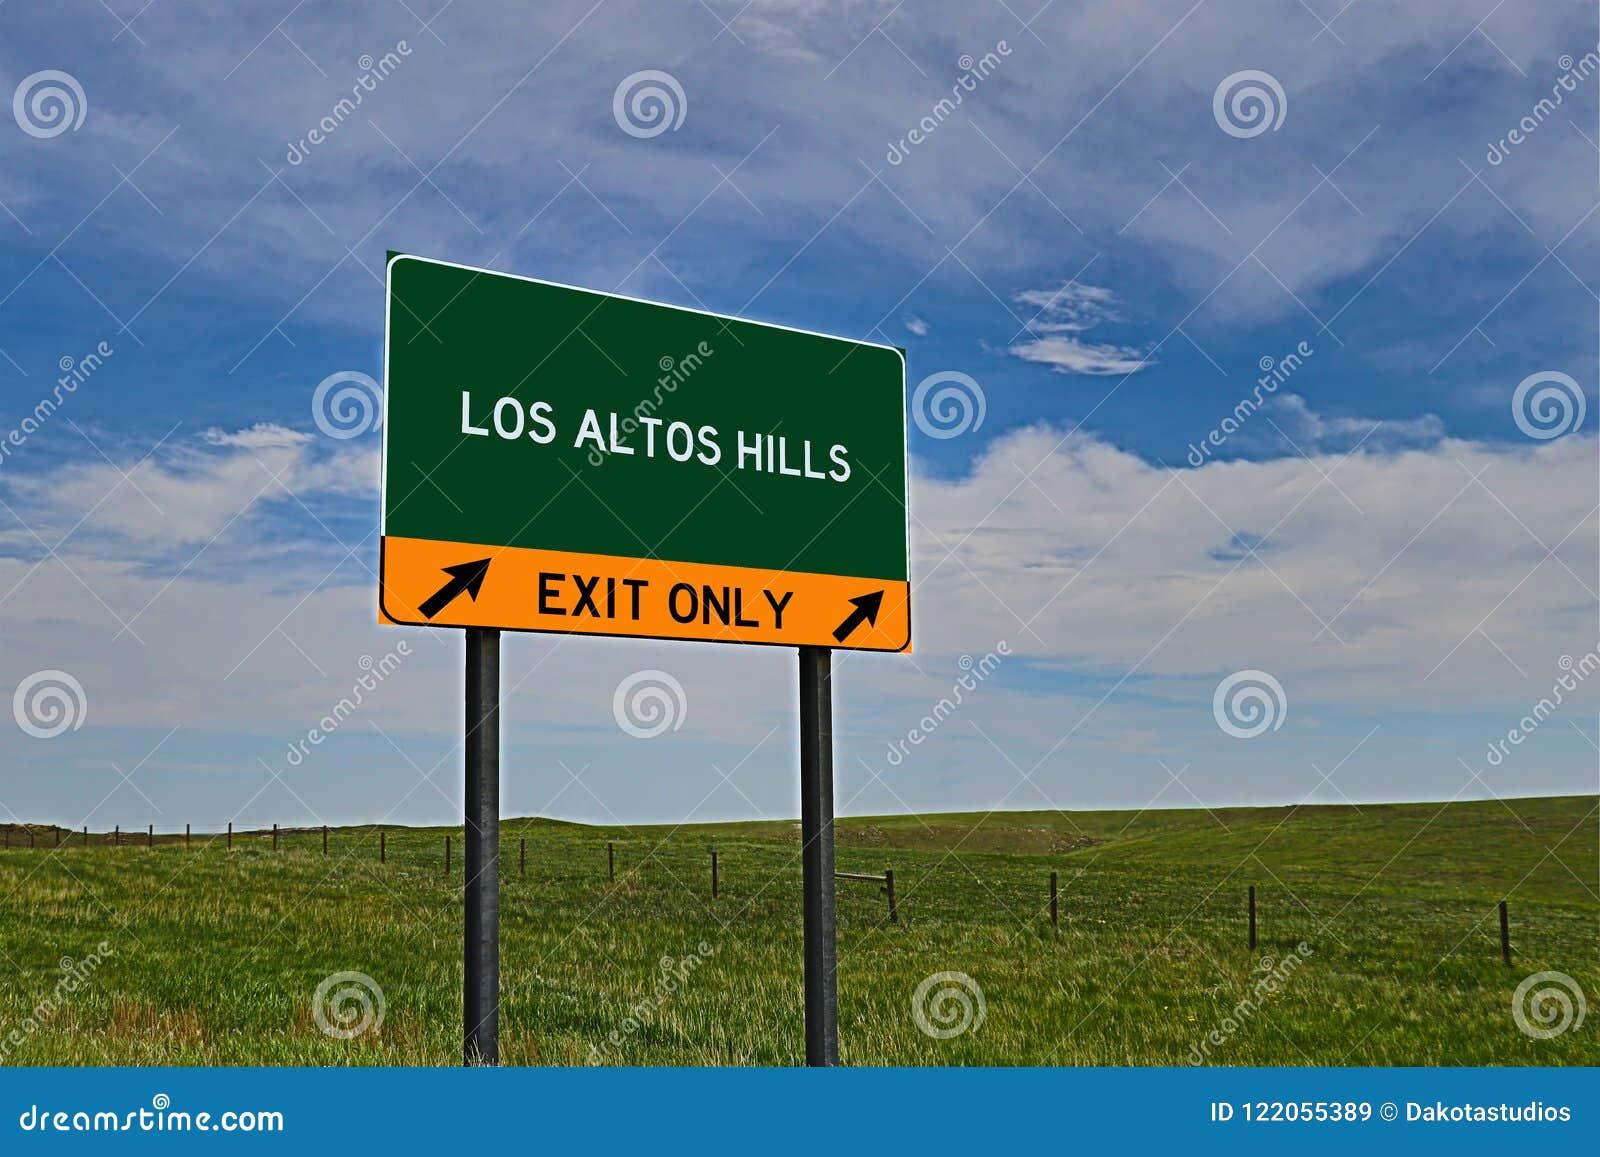 US Highway Exit Sign for Los Altos Hills